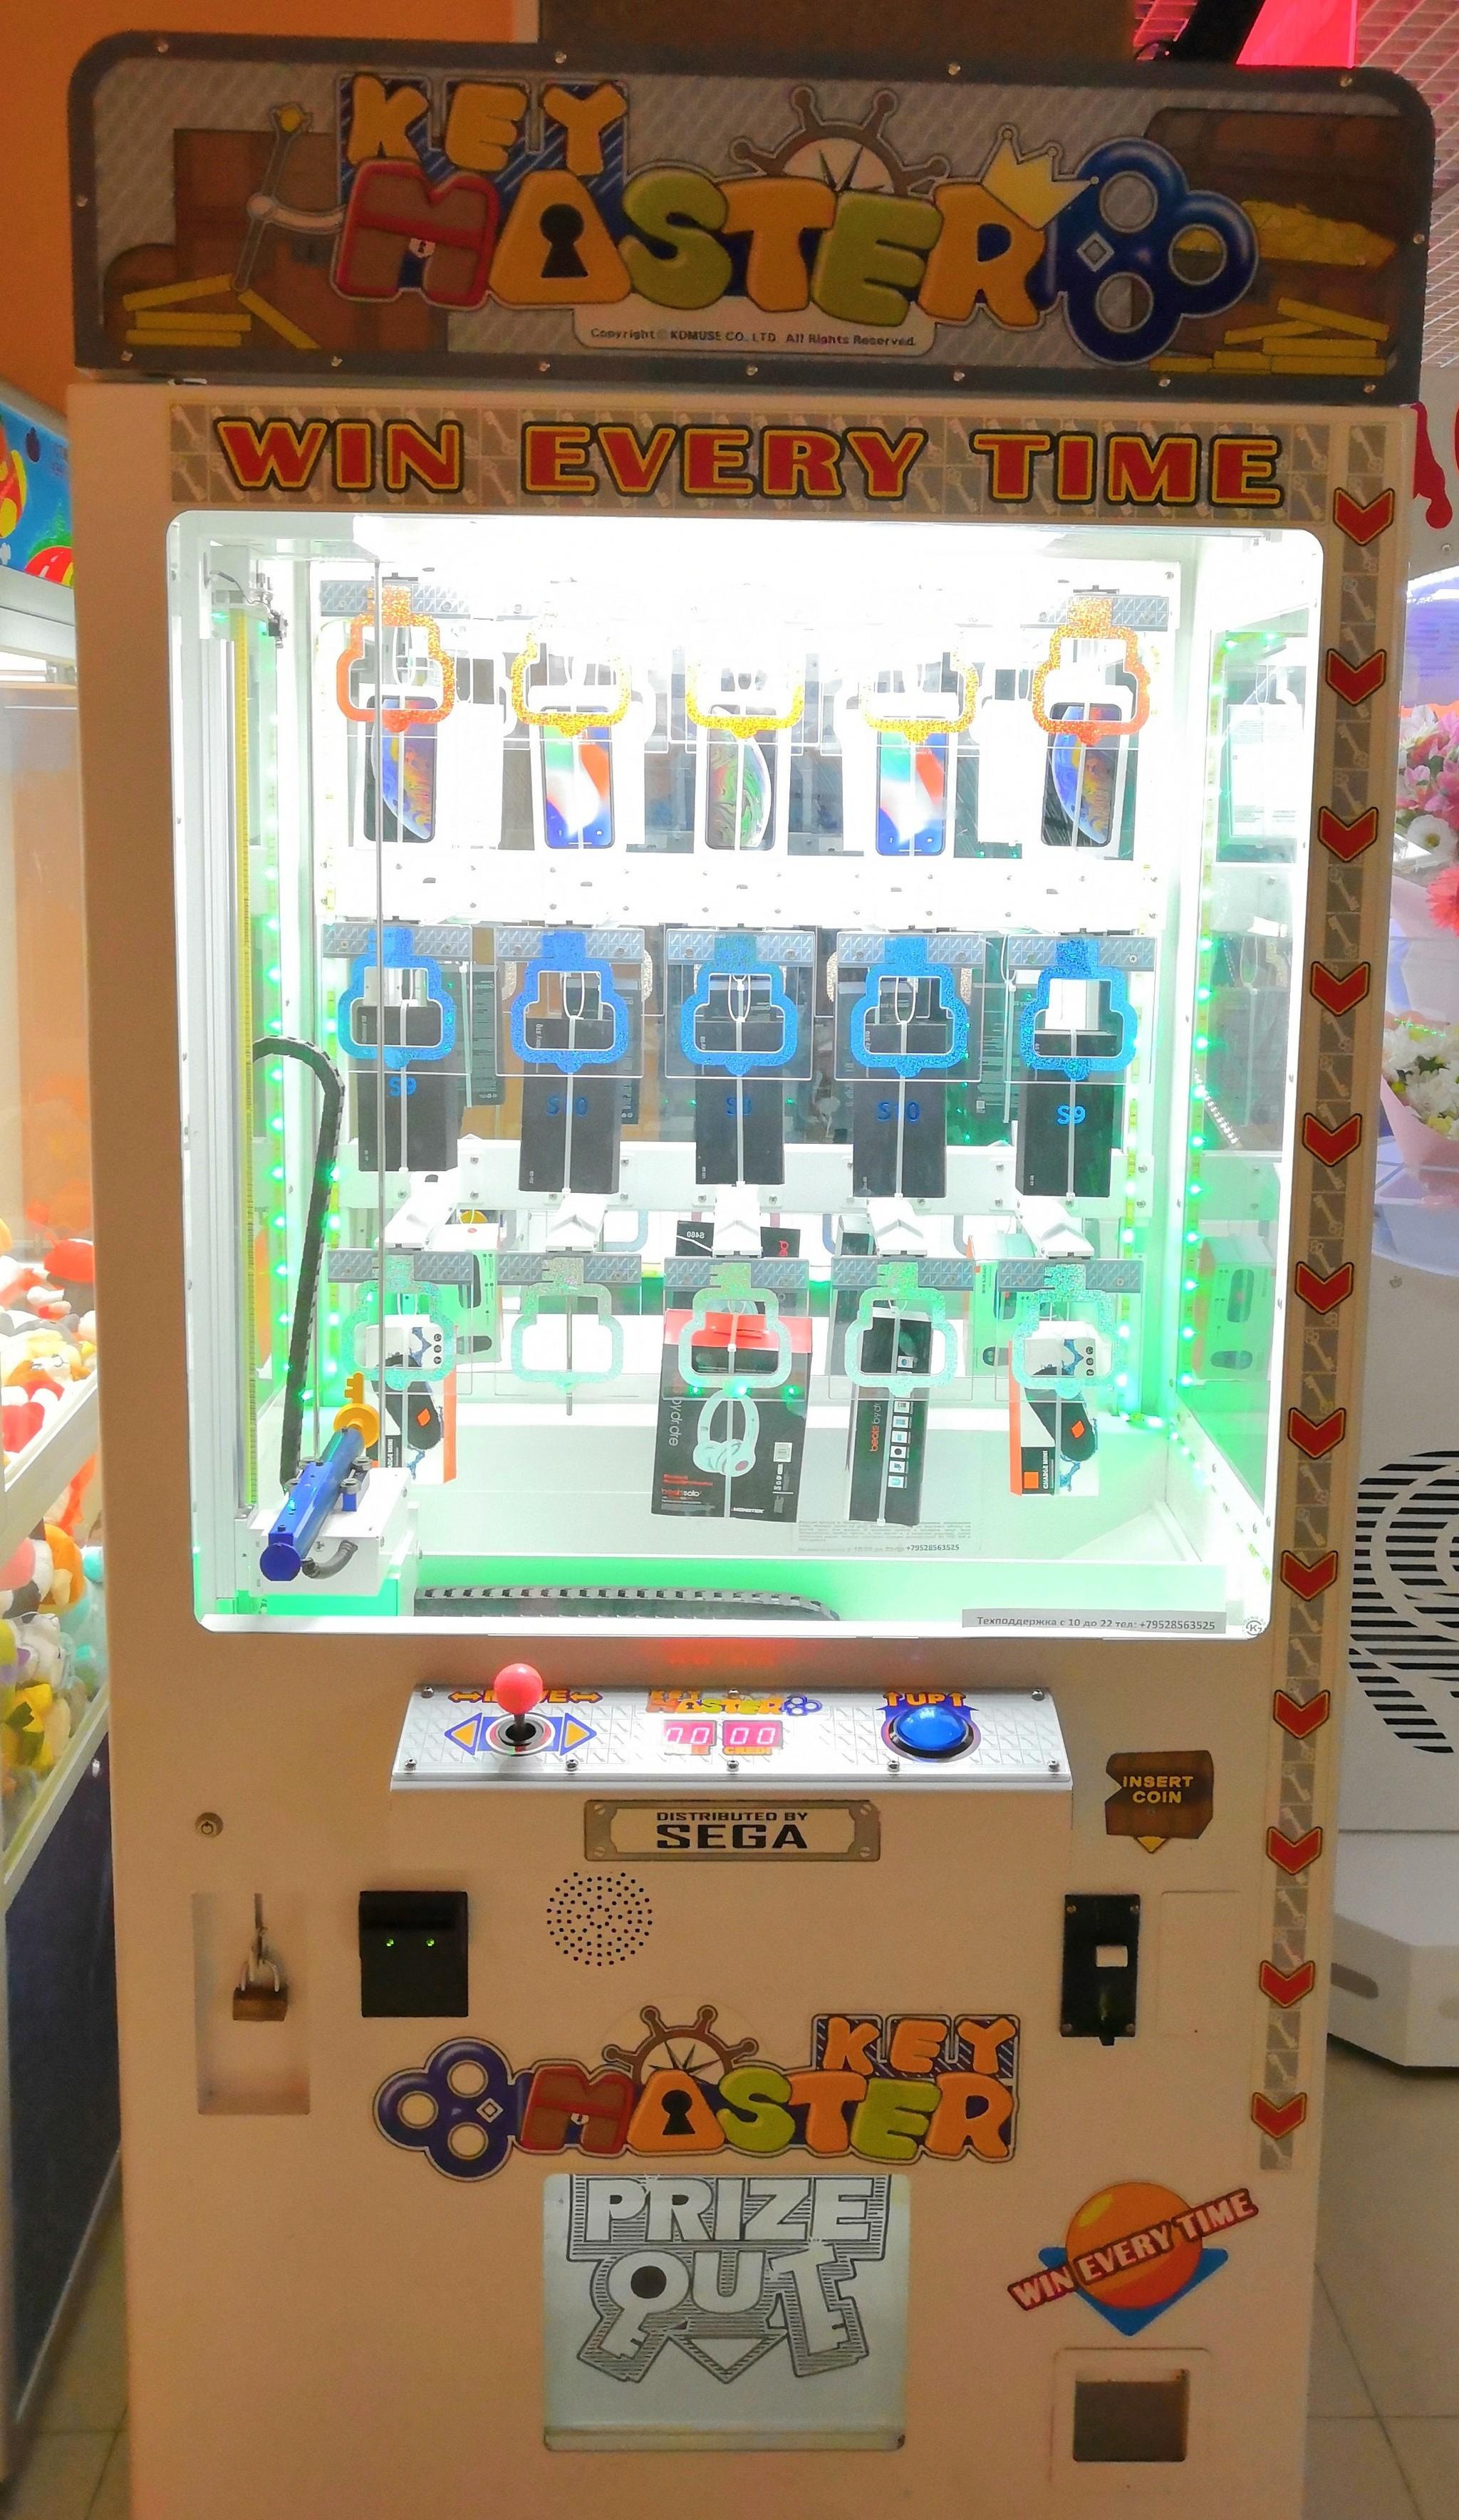 Игровой автомат red hot russian roulette